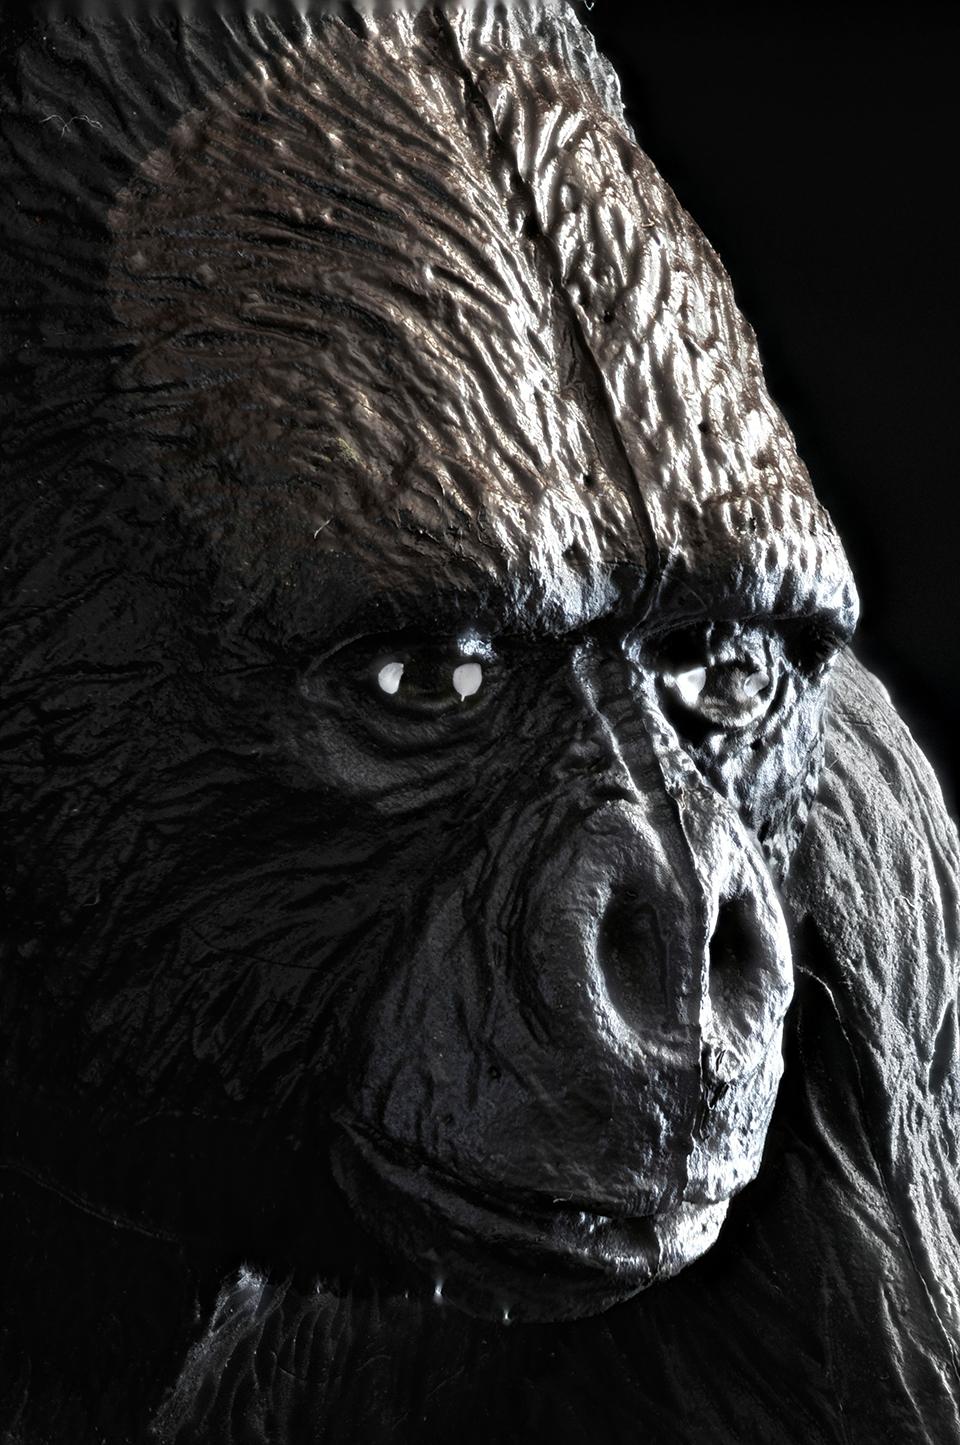 Gorilla Head #2